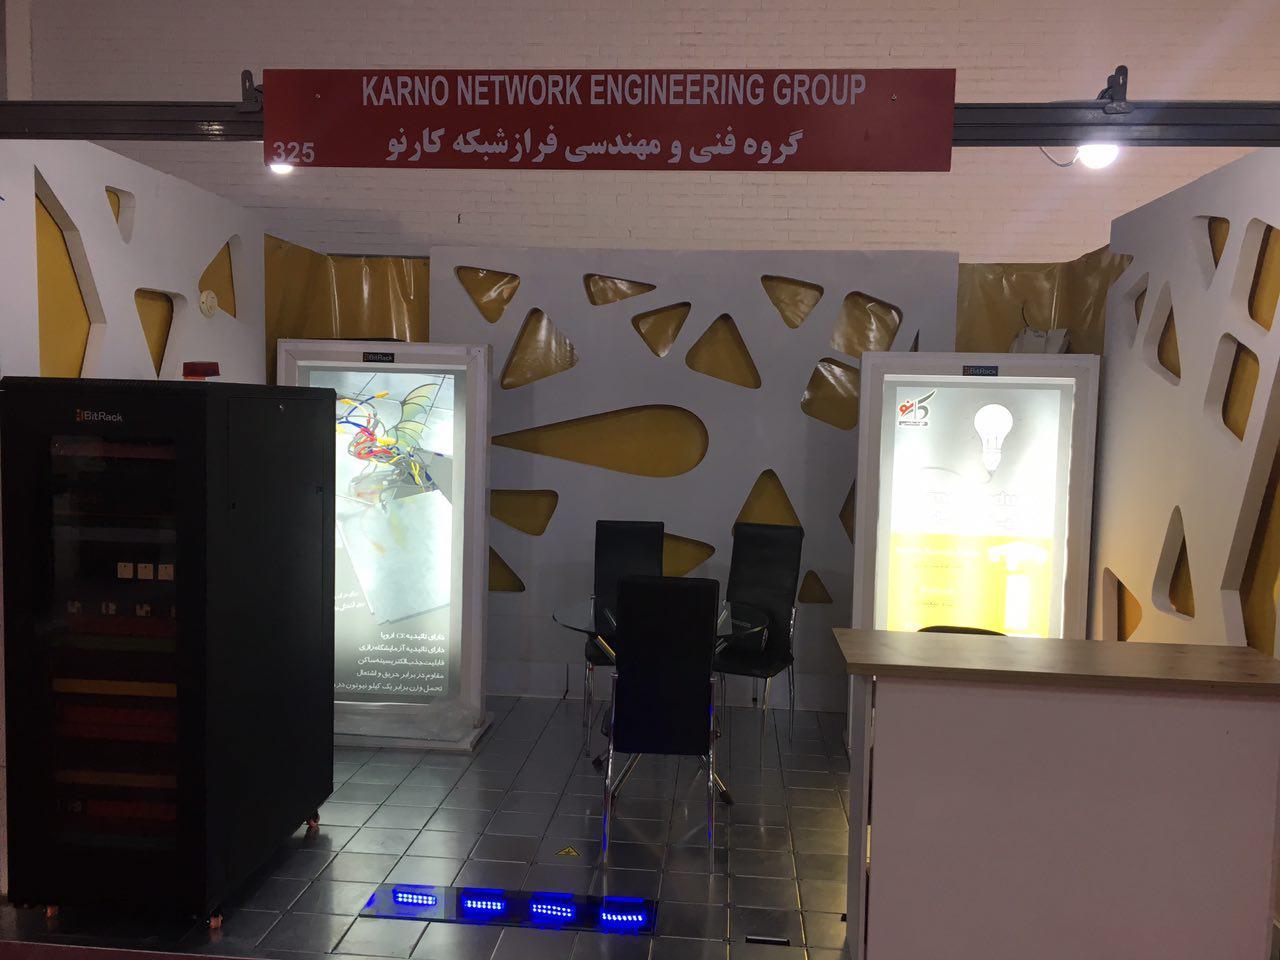 photo_2017-08-20_12-51-02 حضور کارنو در بیست و سومین نمایشگاه بین المللی الکامپ تهران